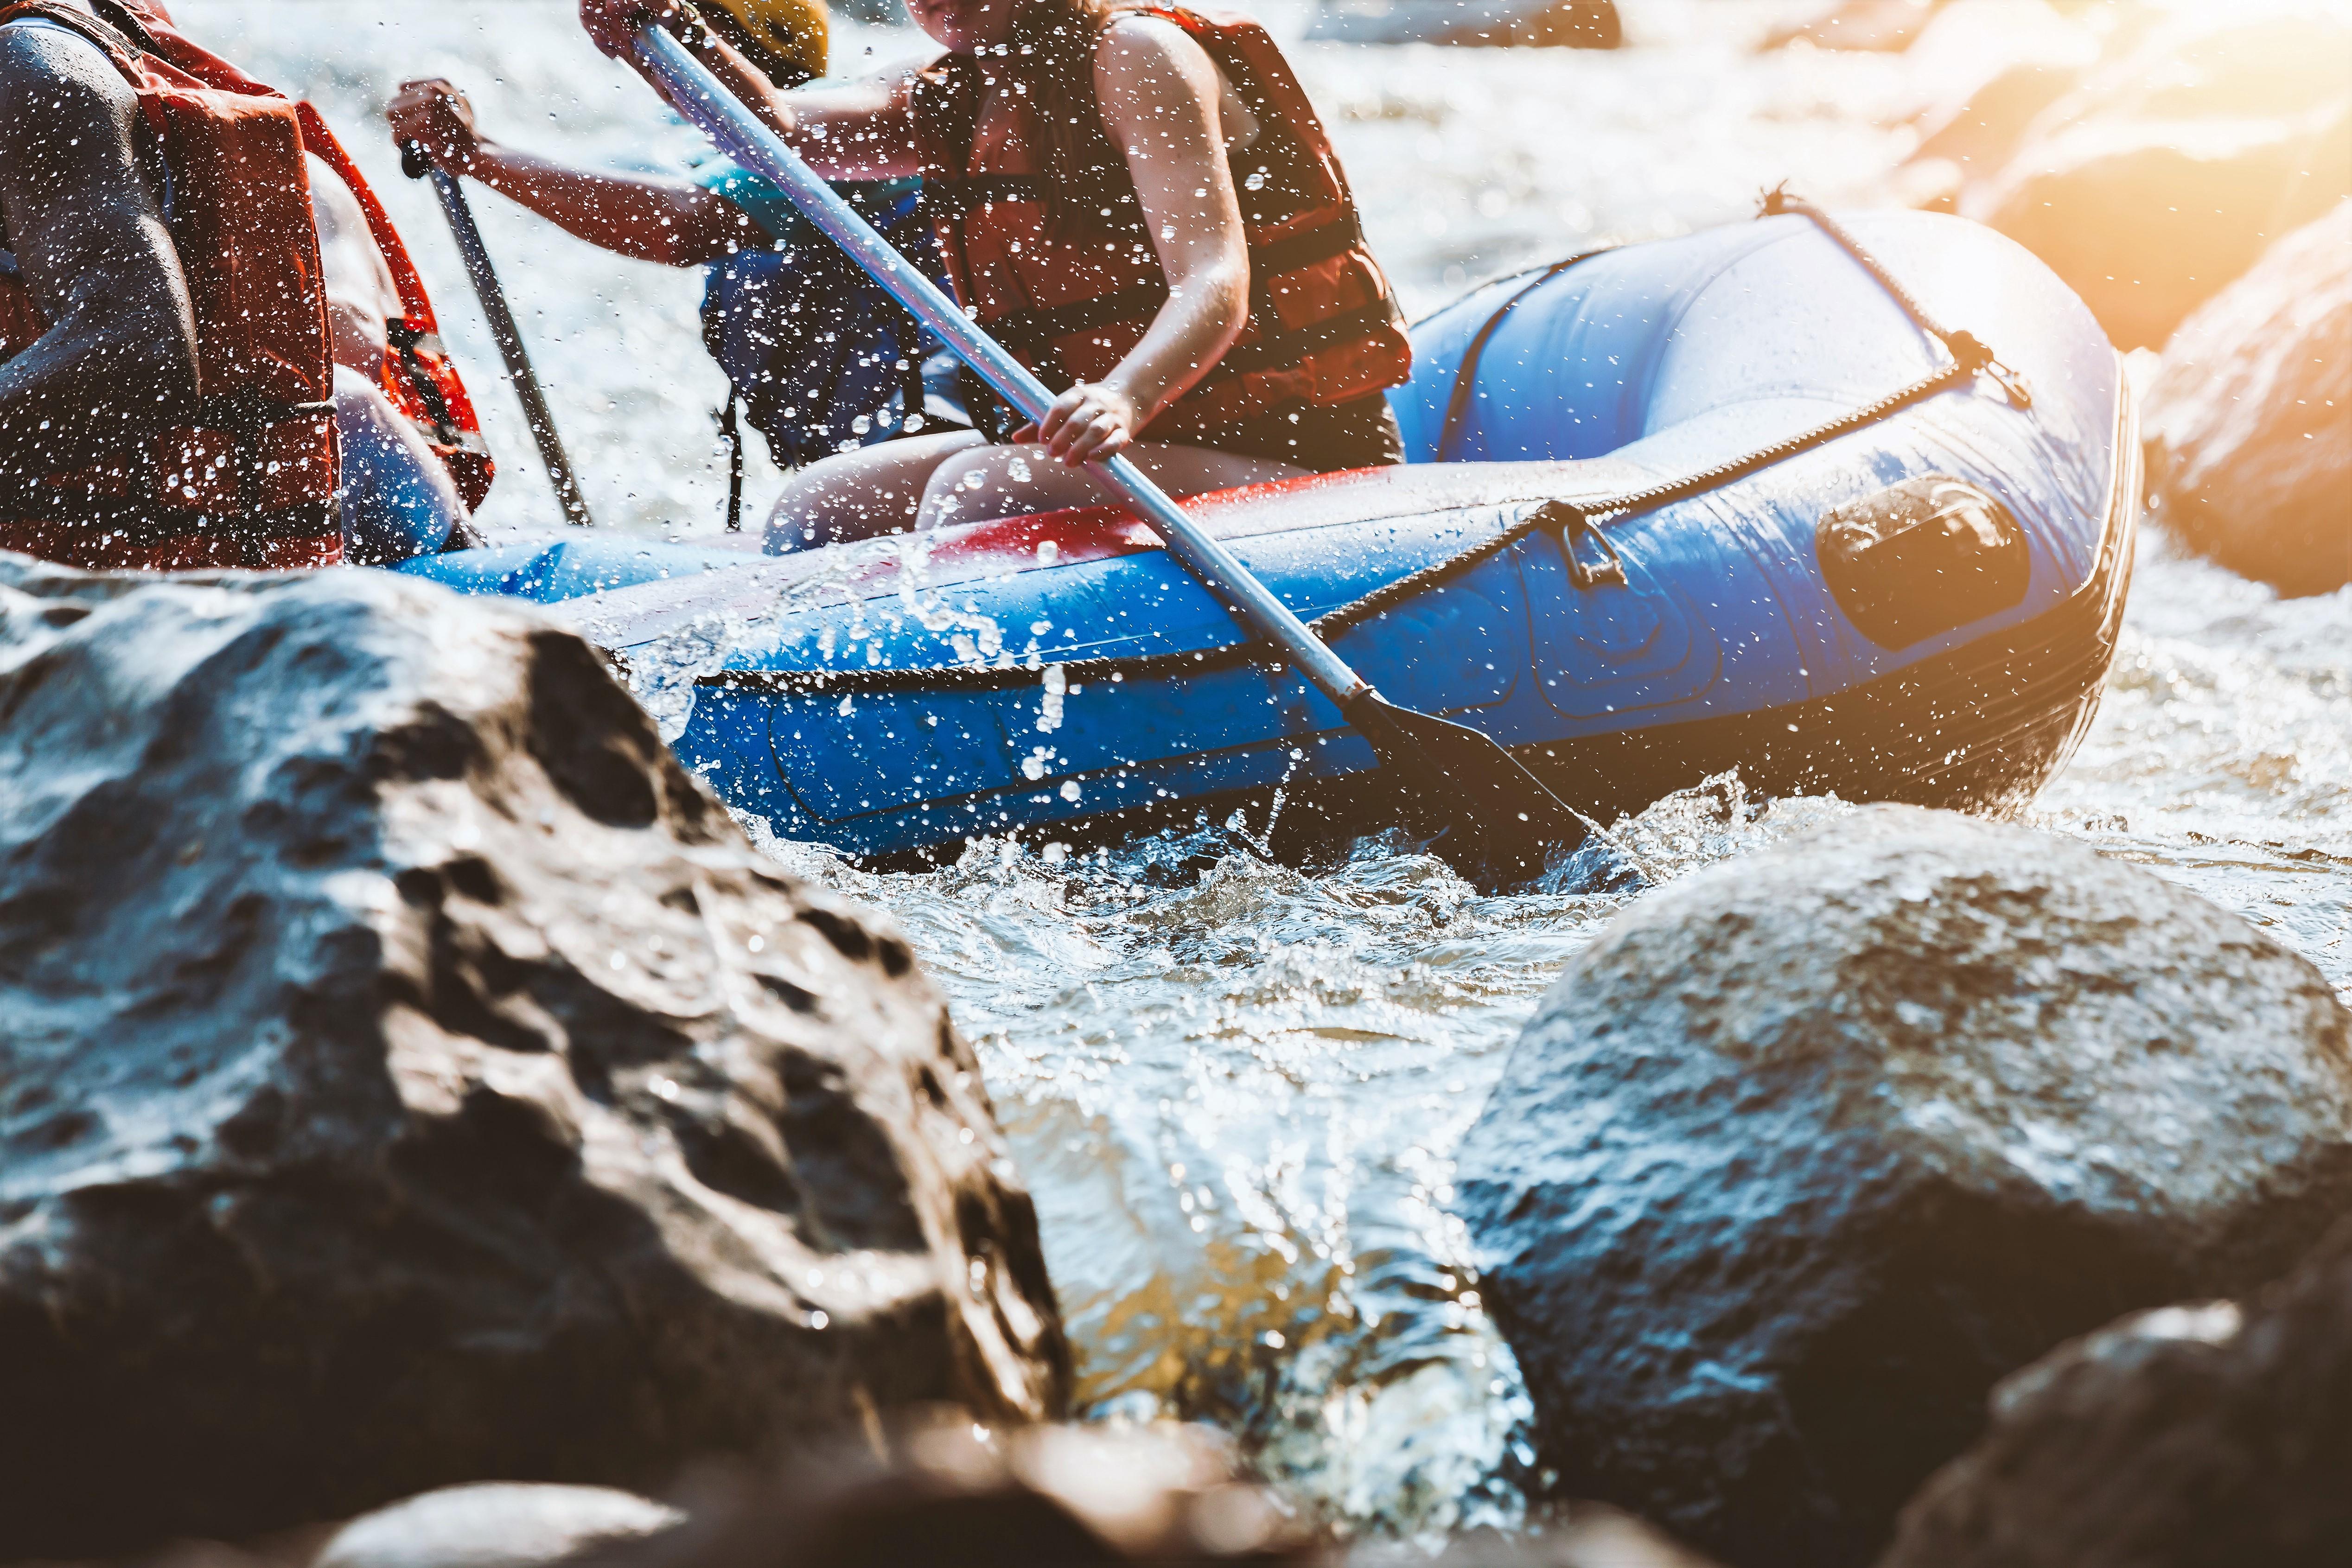 rafting_shutterstock - Modified